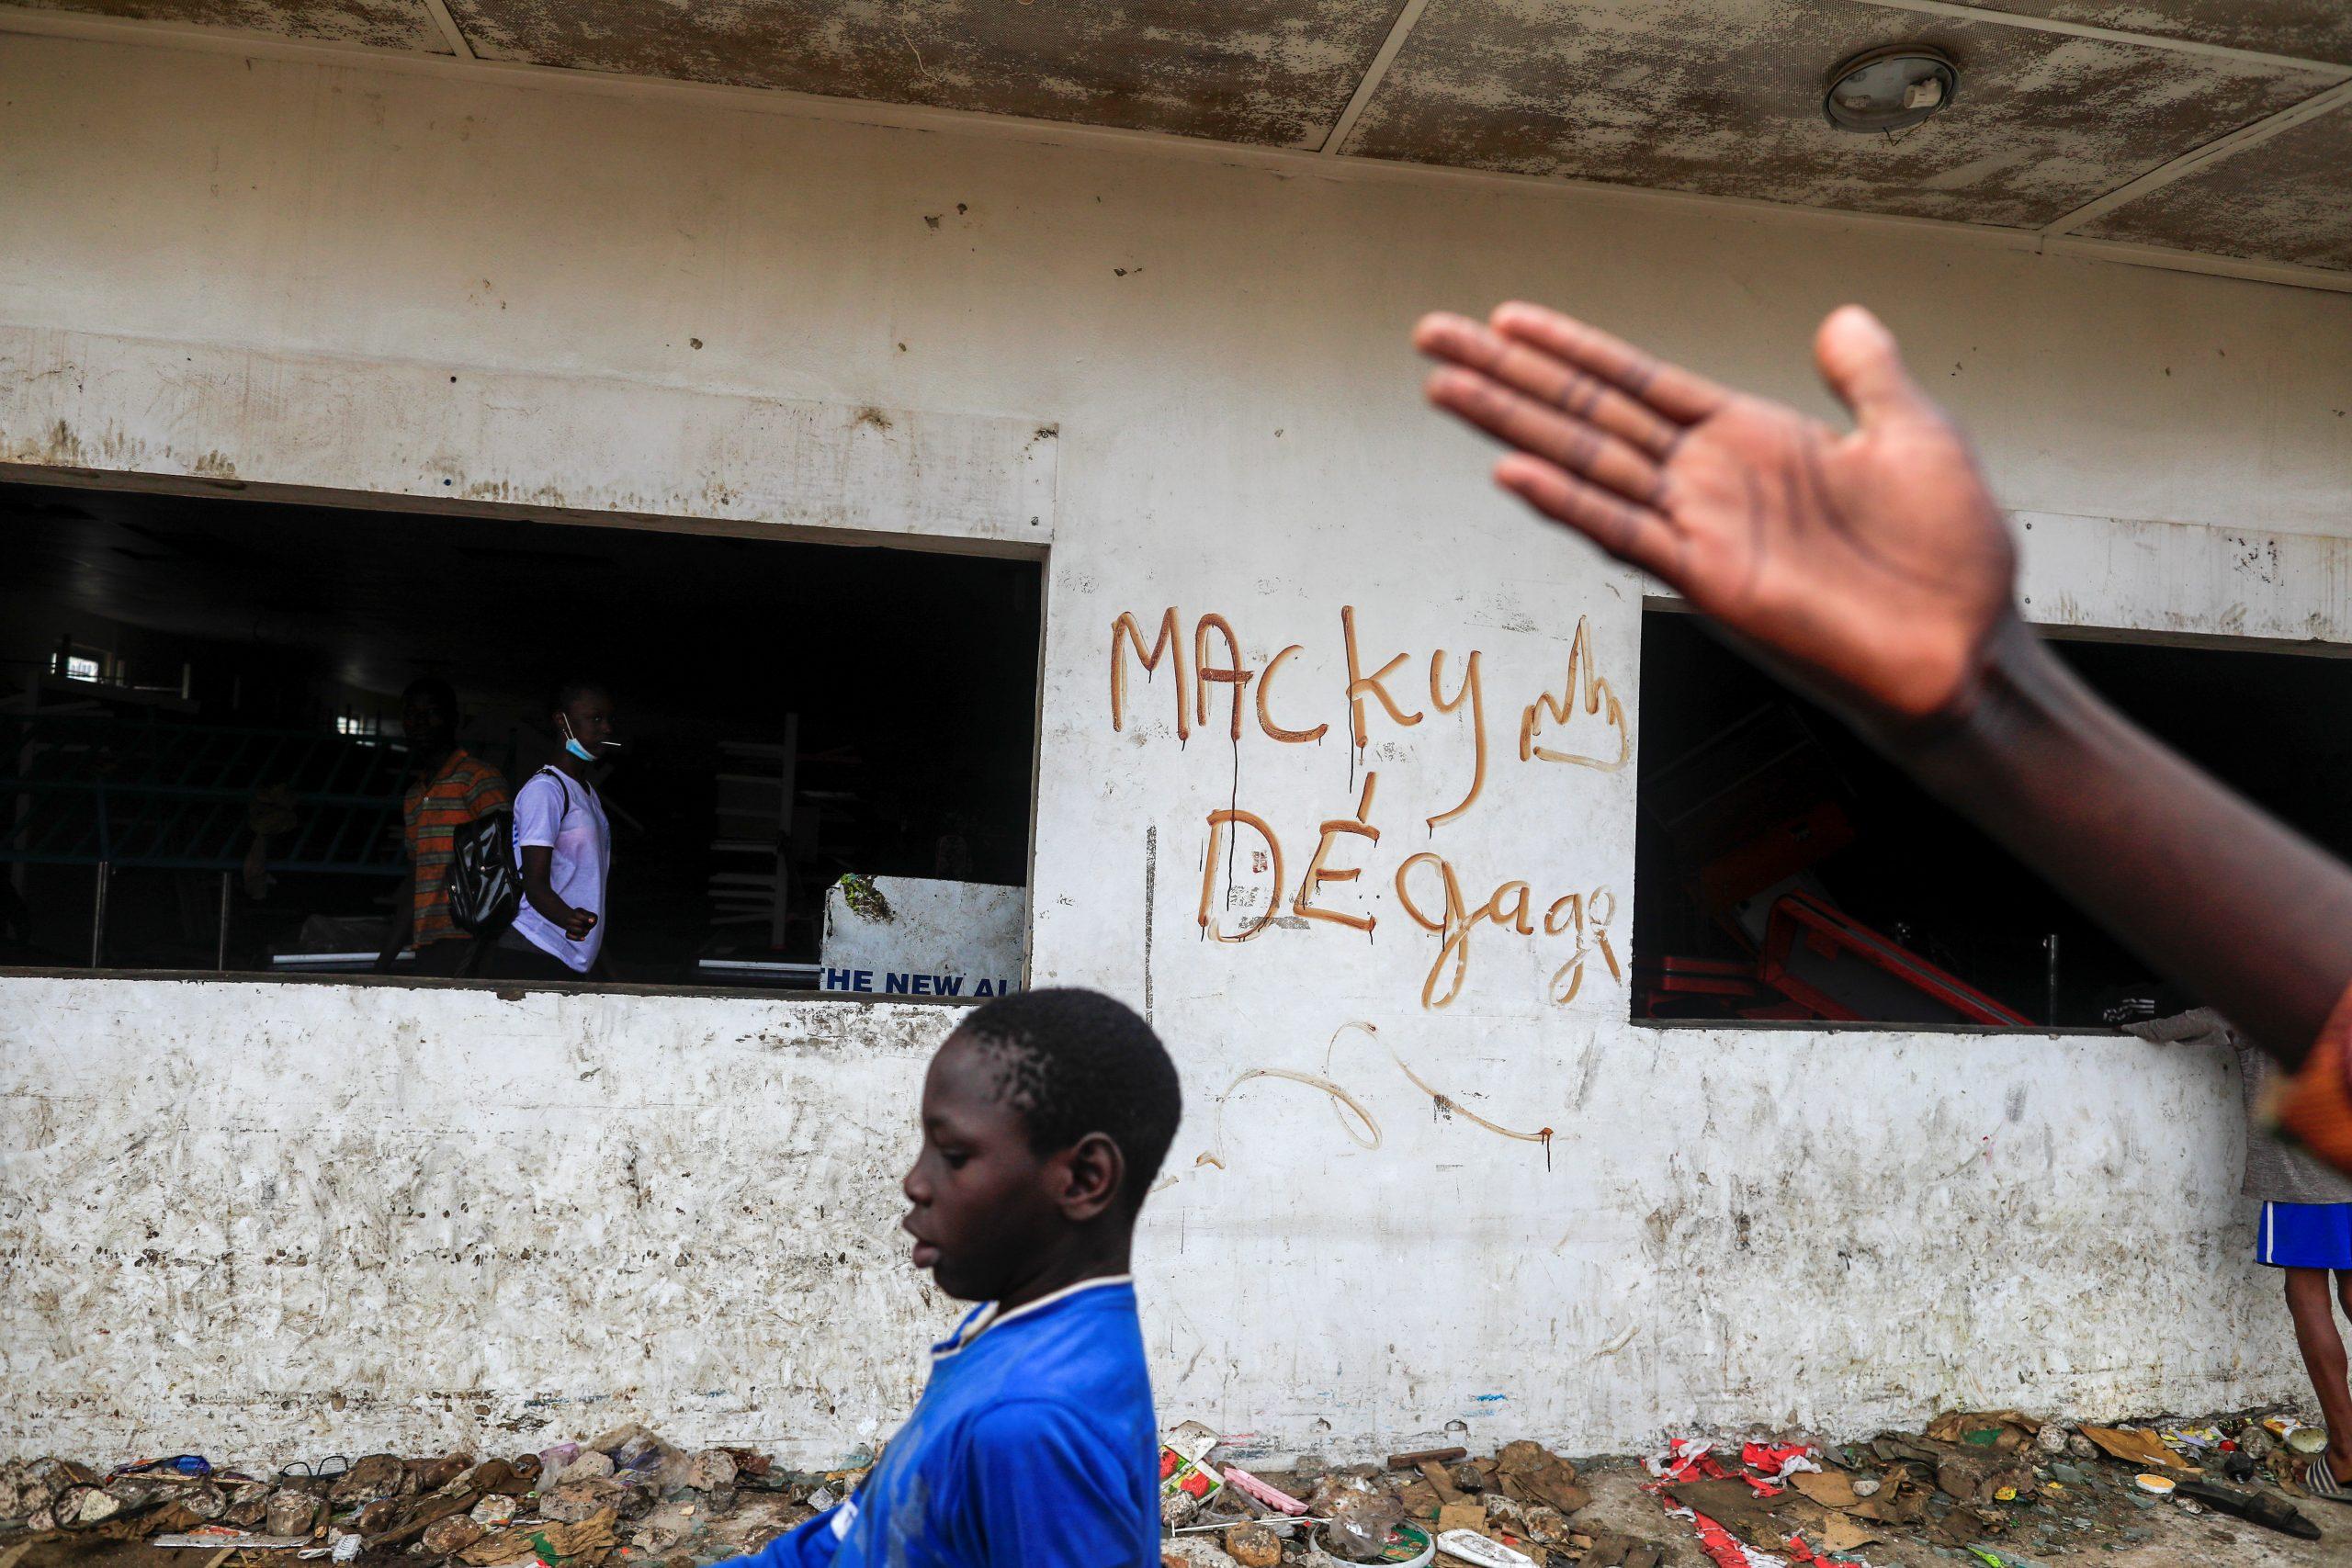 Un graffiti «Macky Sall dégage», dans les rues de Dakar, le 5 mars 2021.